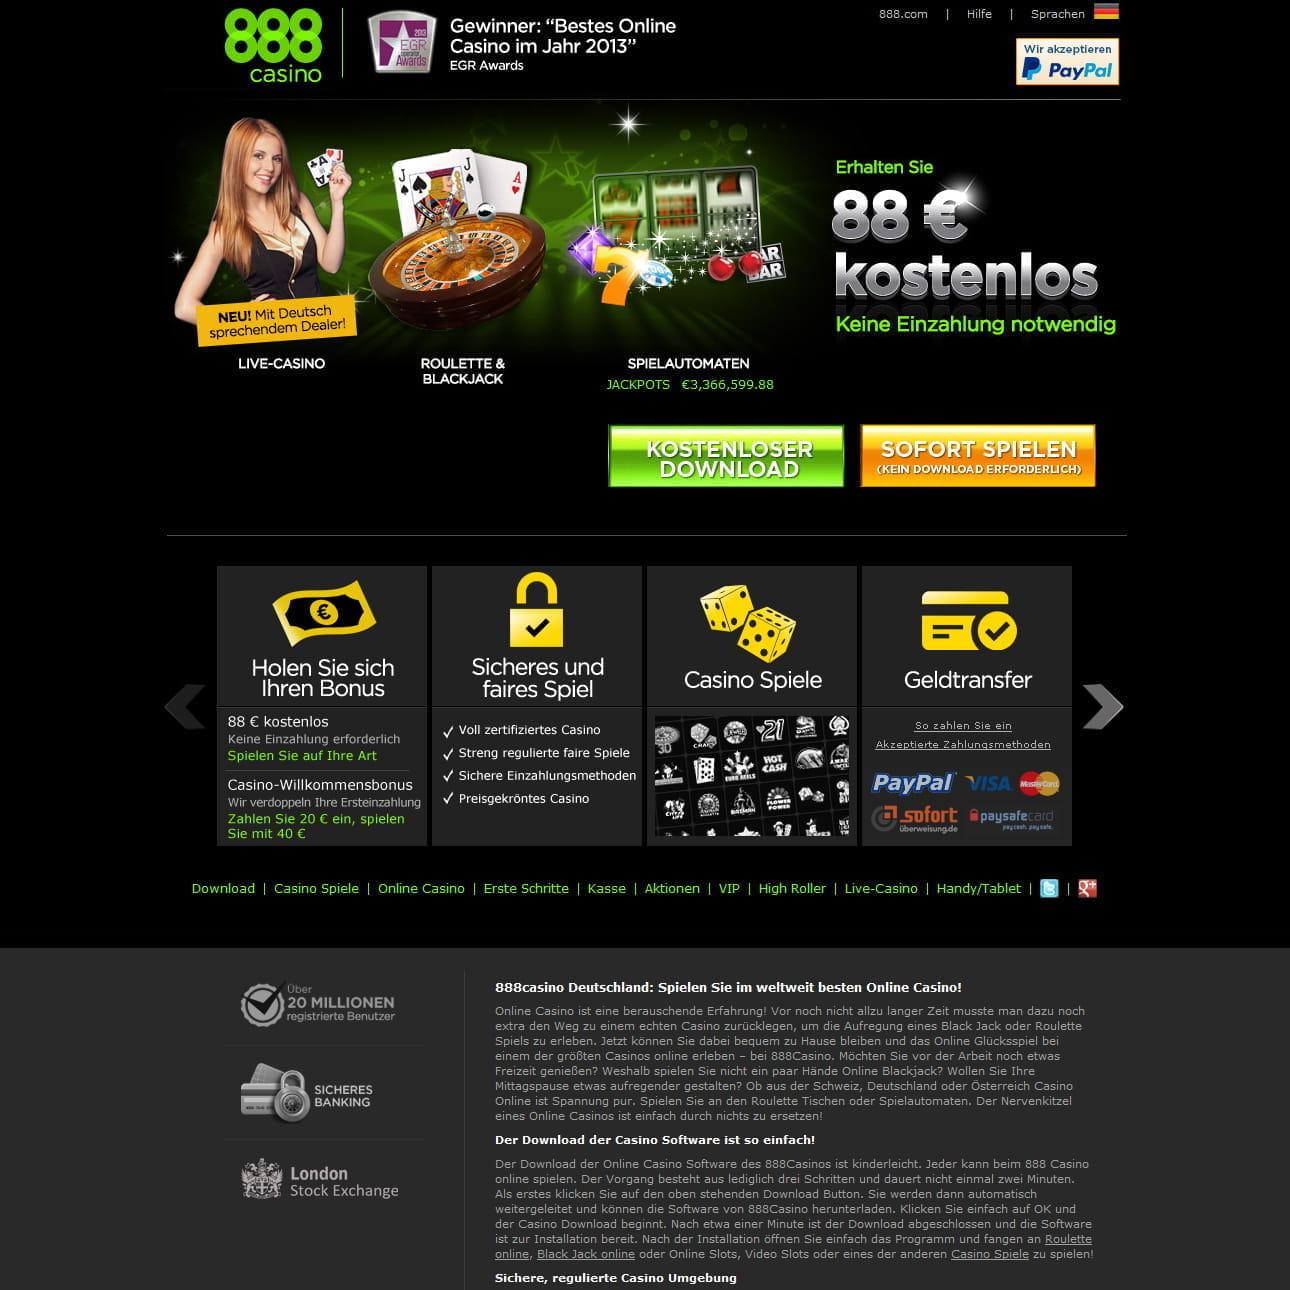 casino 888 auszahlung dauer